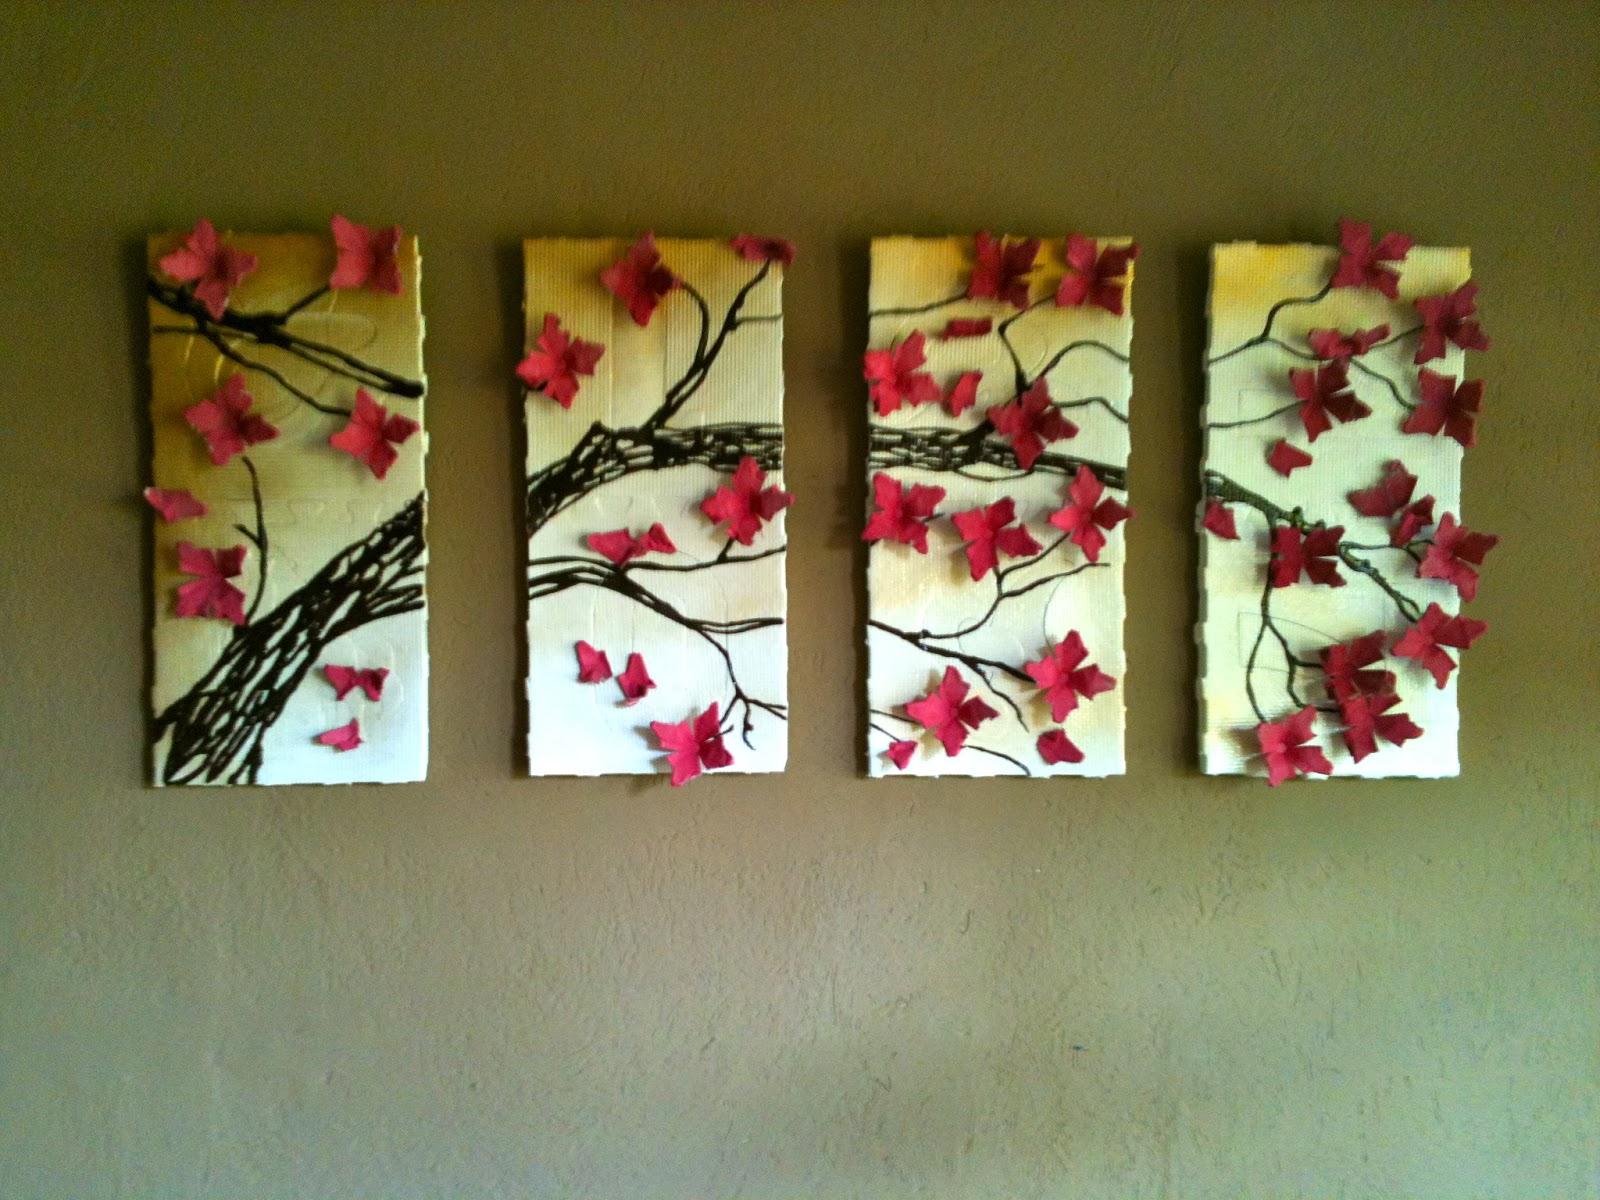 Upcycling DIY Wall Art: 4 Panel Cherry Blossom Tree ...